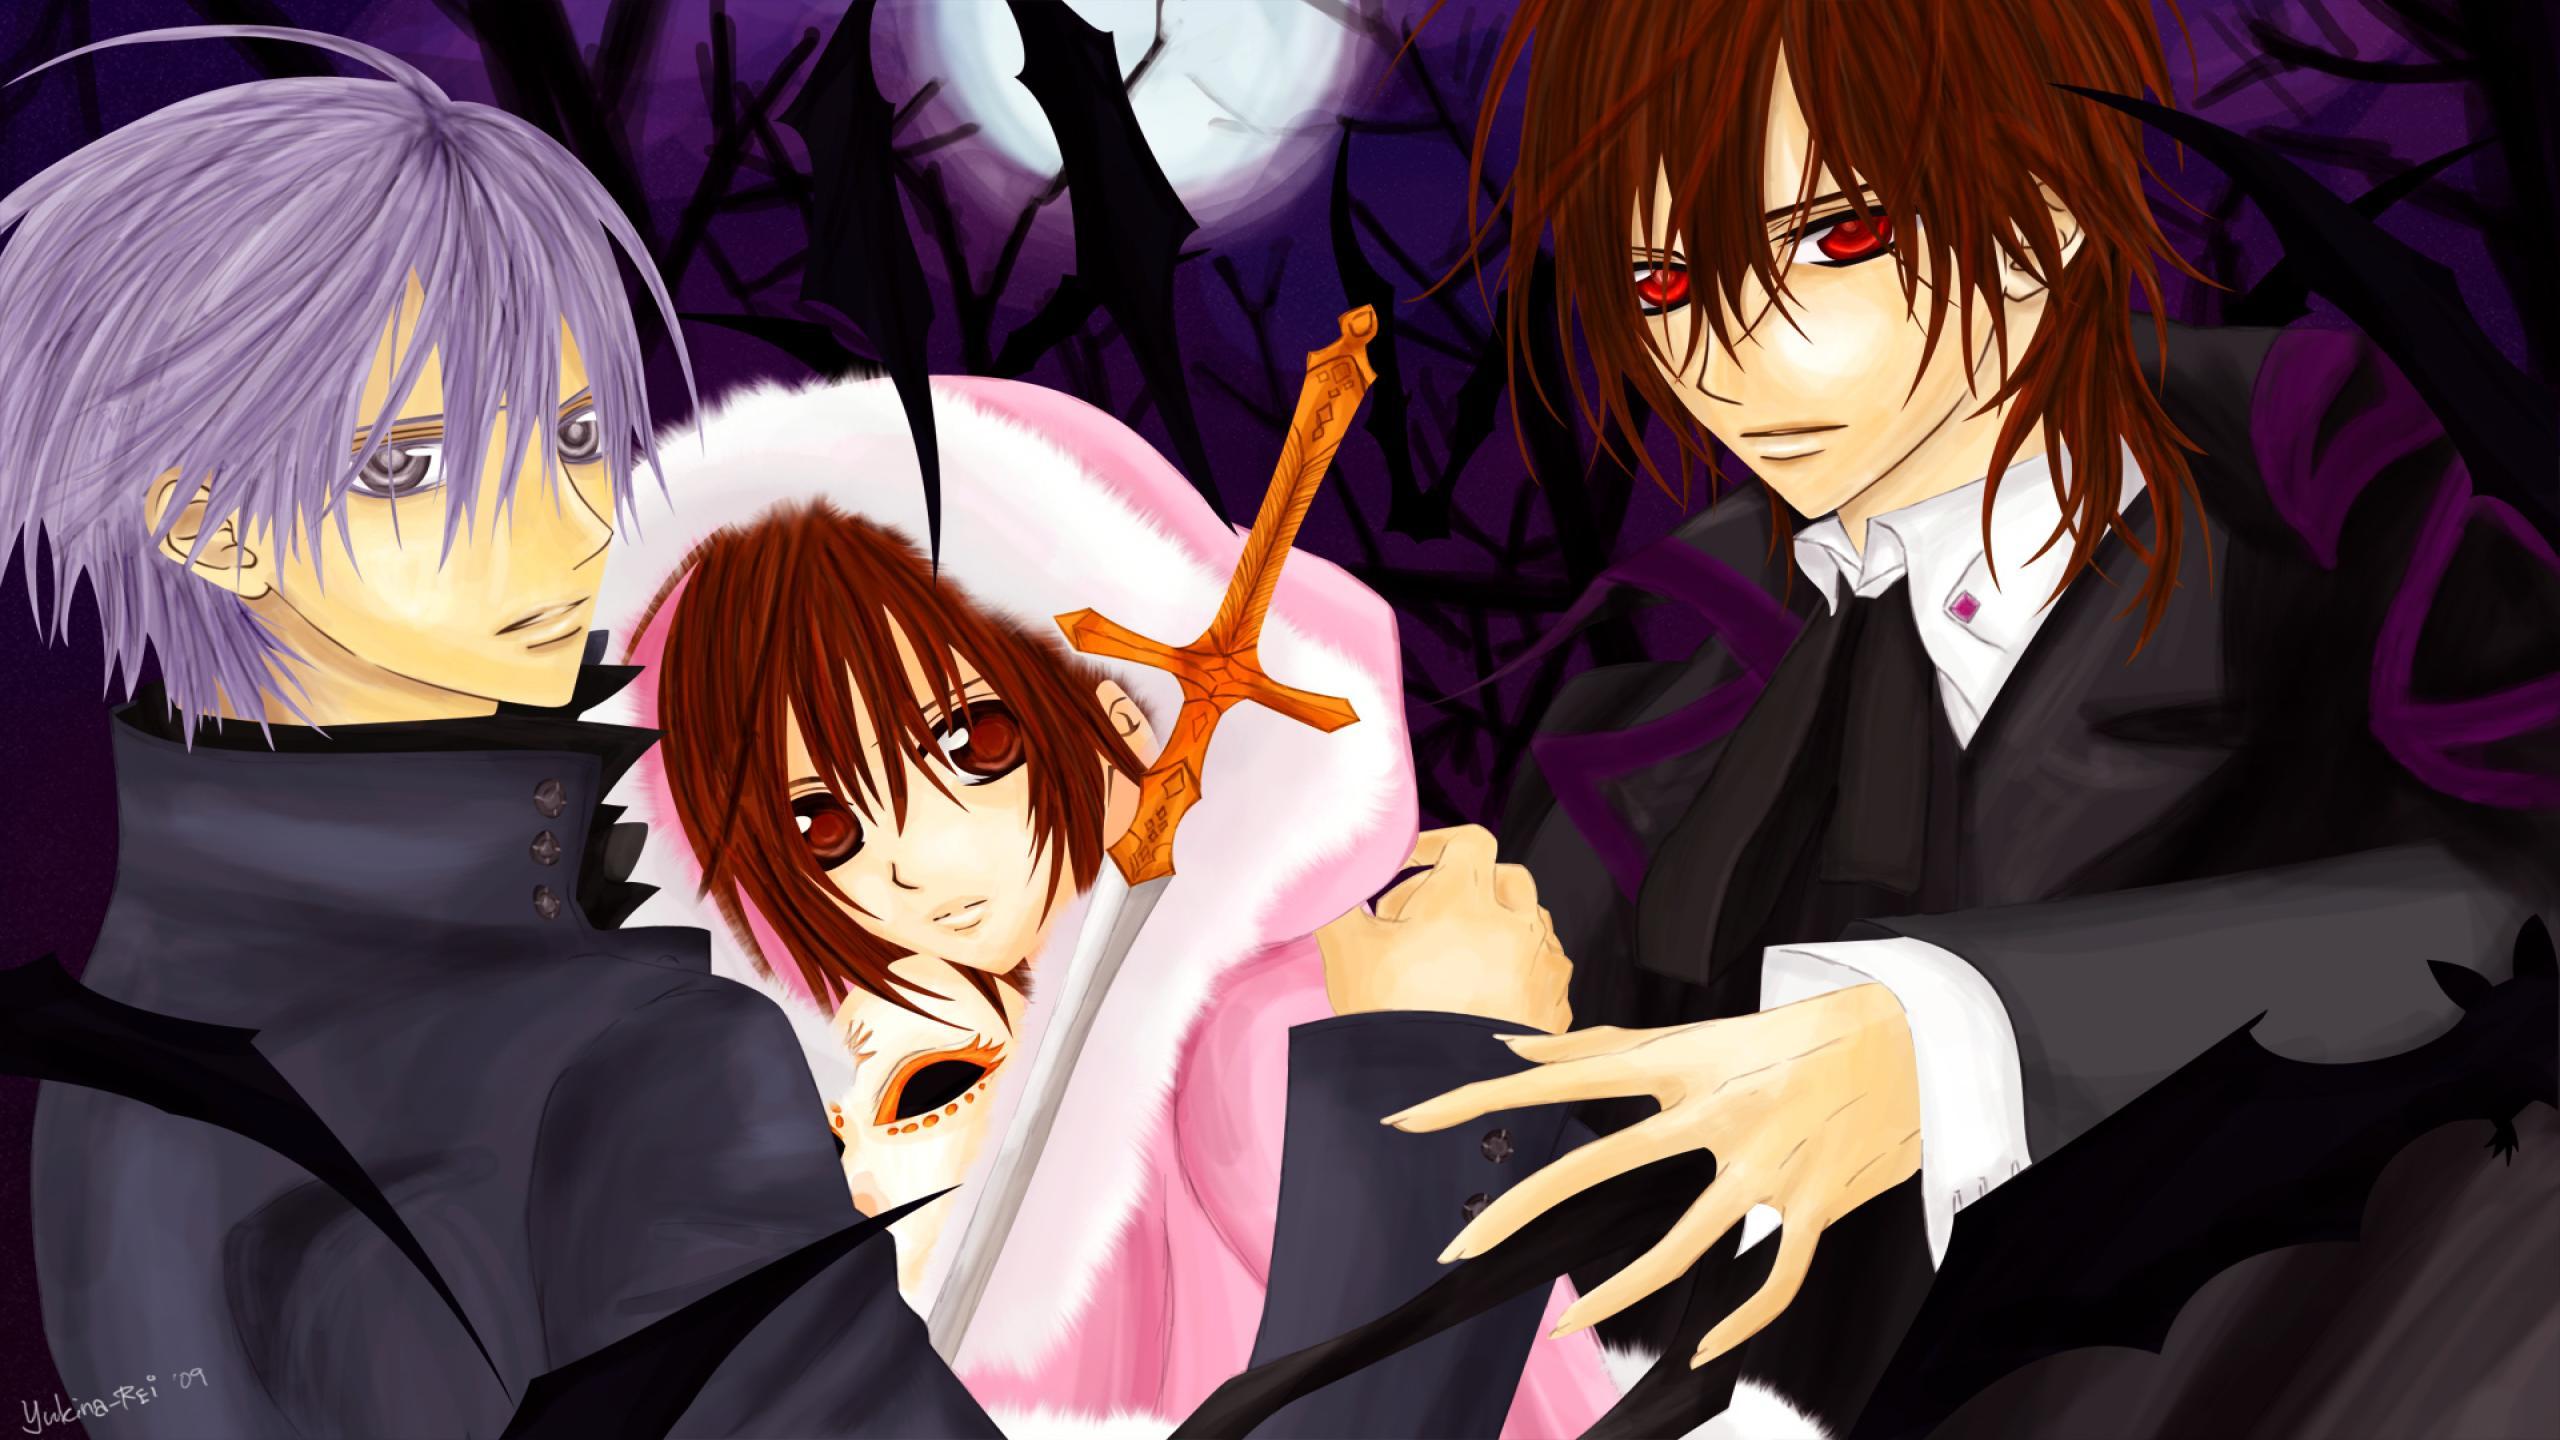 Anime hd wallpaper 2560x1440 wallpapersafari - Wallpaper vampire anime ...